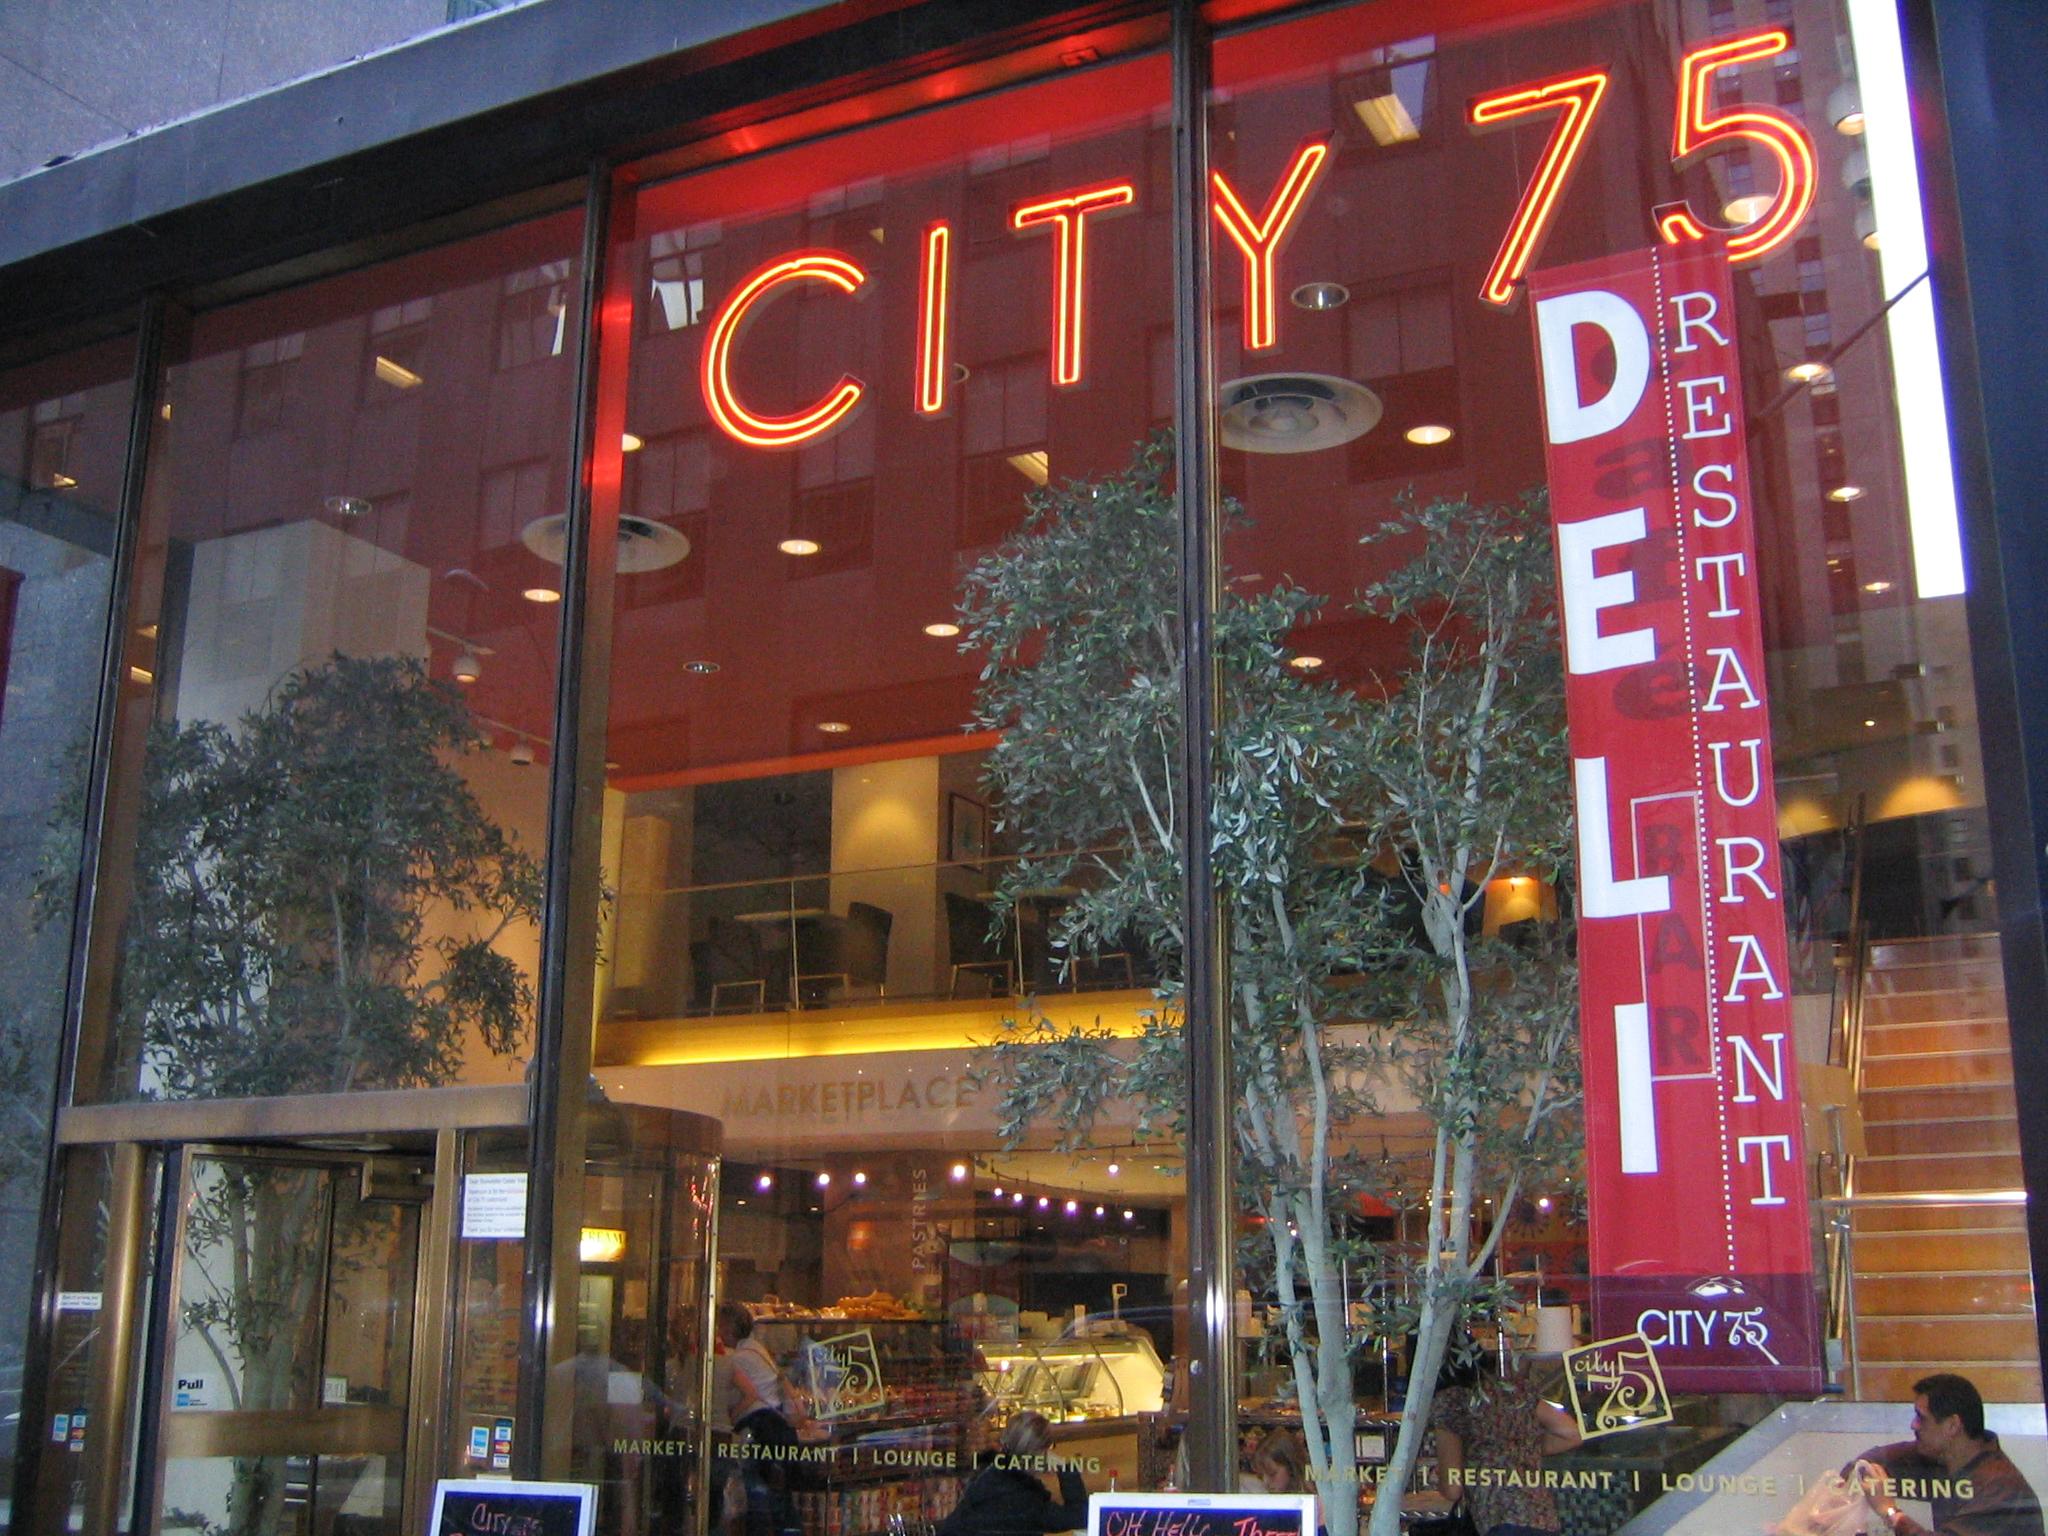 City 75